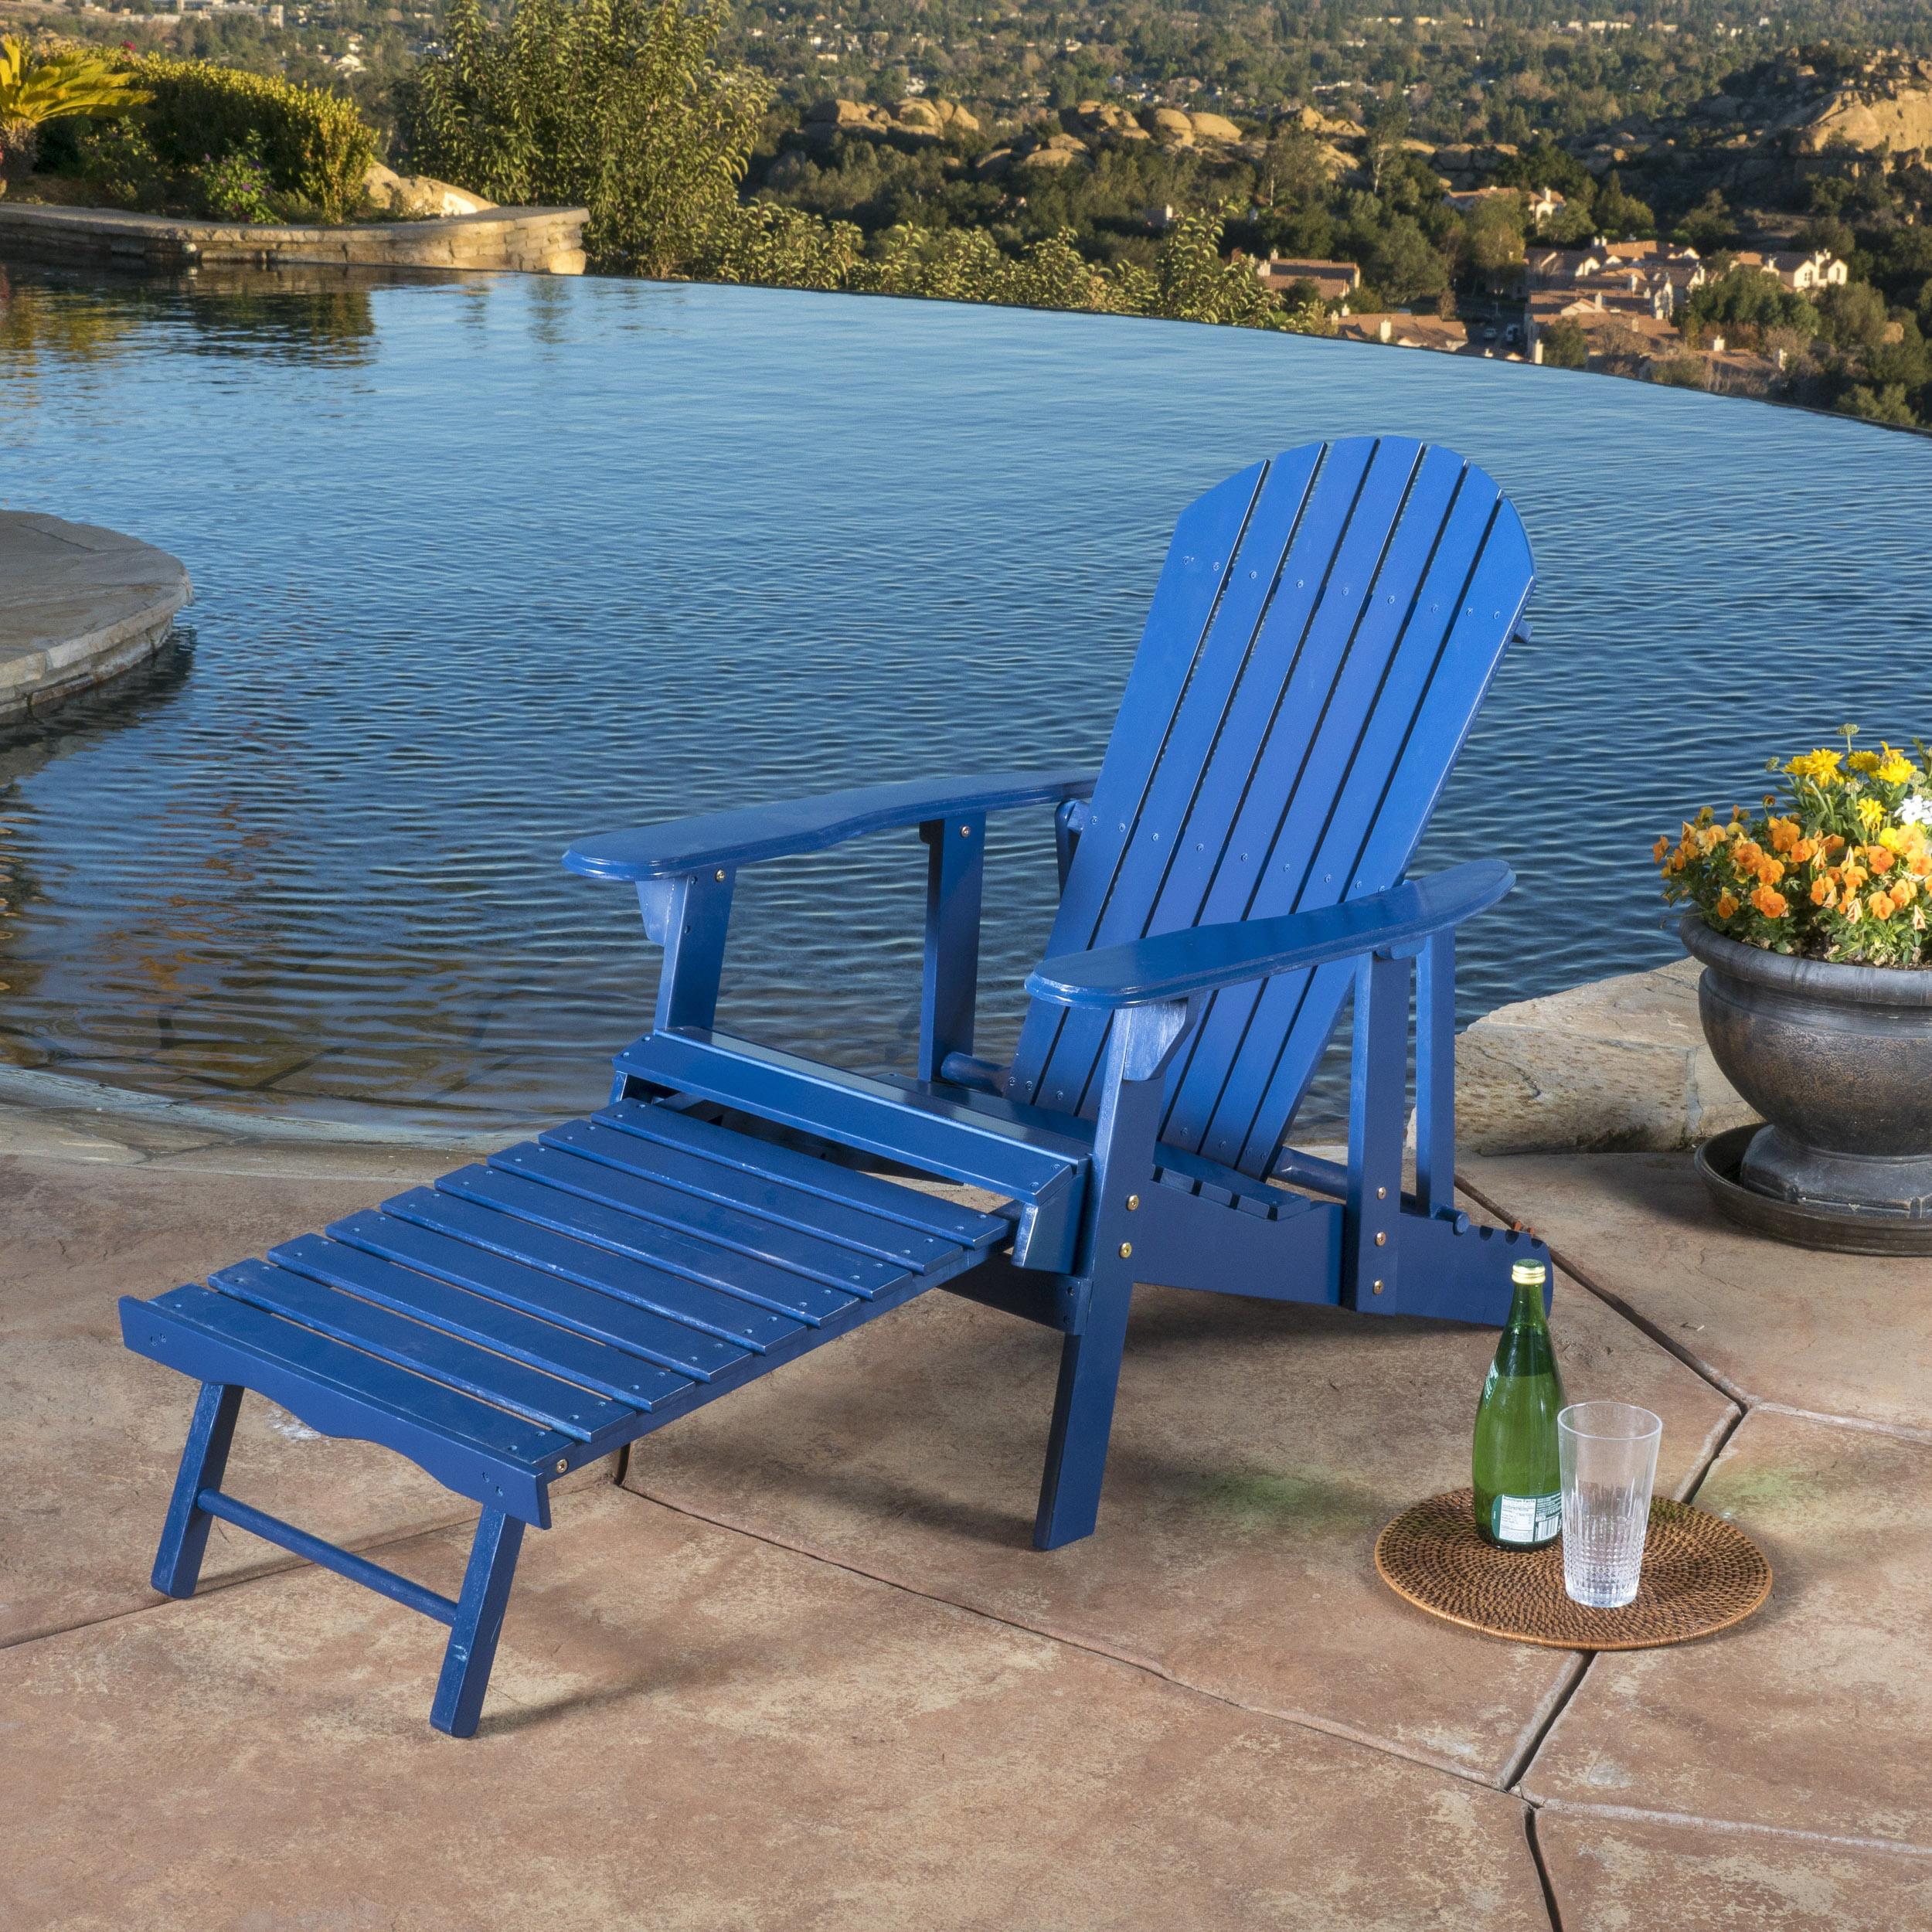 Munoz Reclining Wood Adirondack Chair with Footrest, Blue